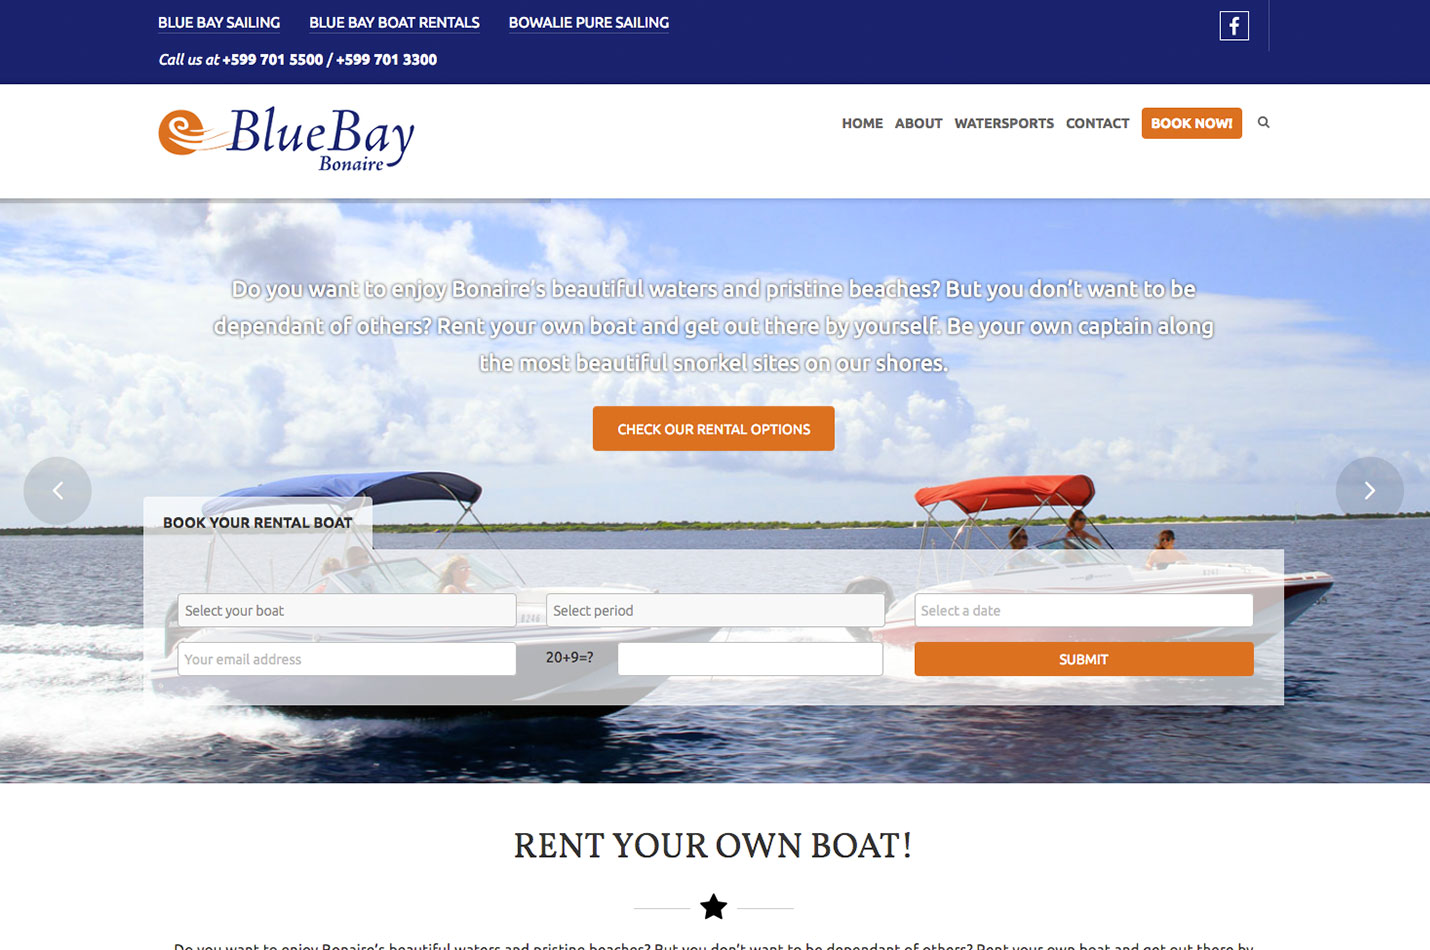 blue bay bonaire website design